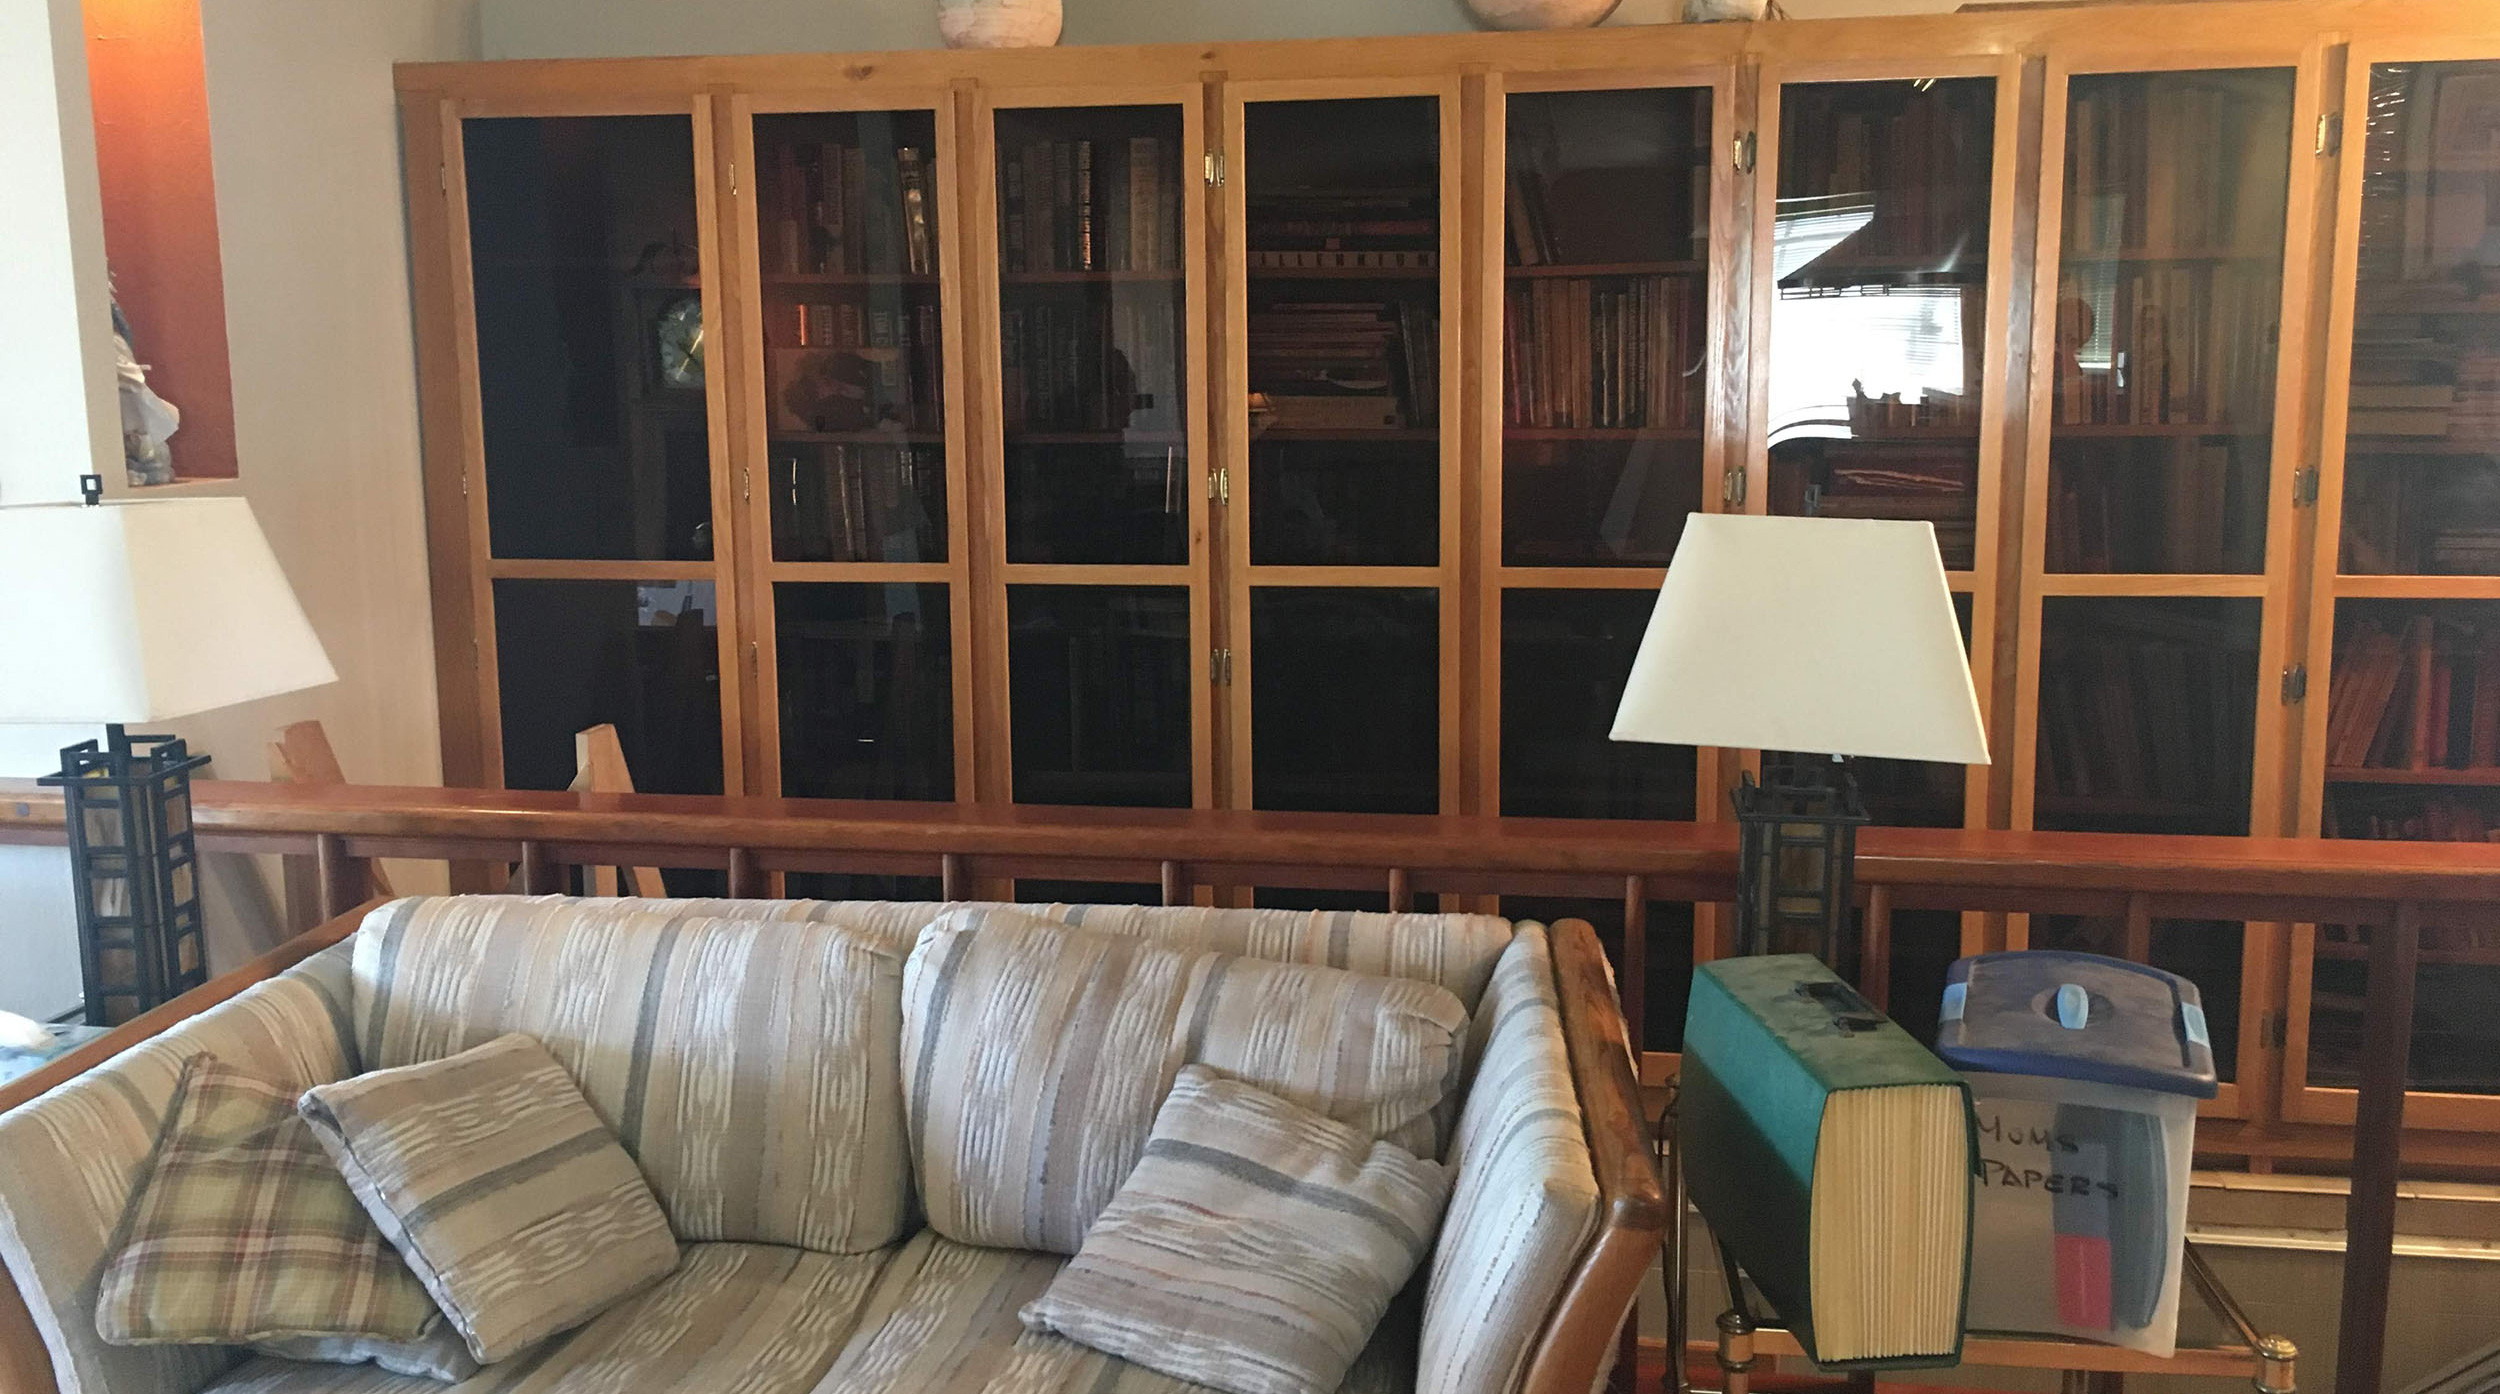 5a_frontroom_shelves.jpg